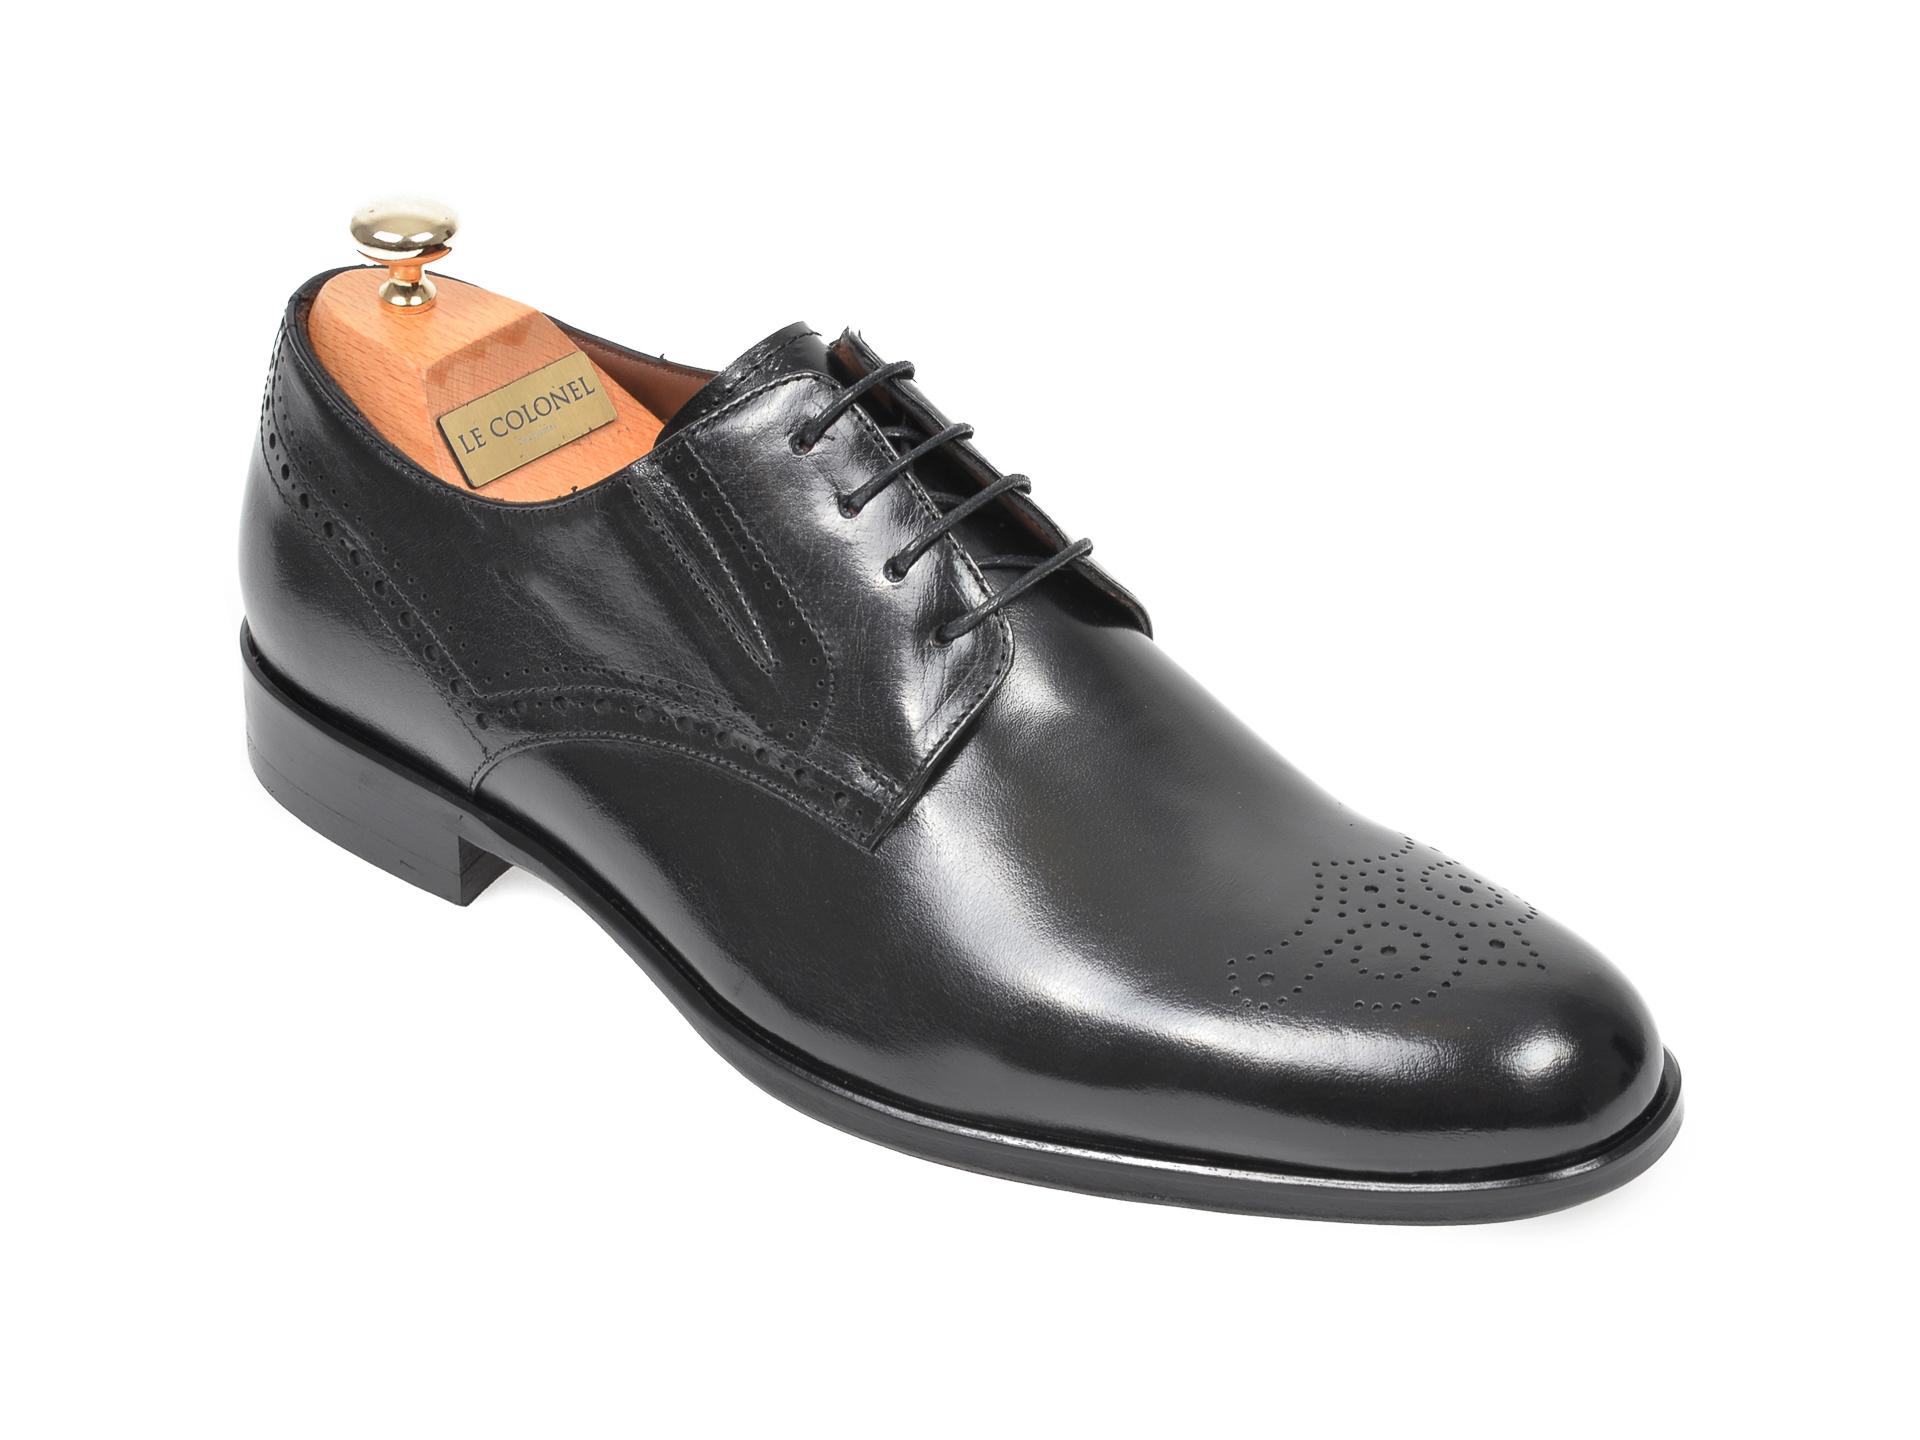 Pantofi Le Colonel Negri, 62401, Din Piele Naturala